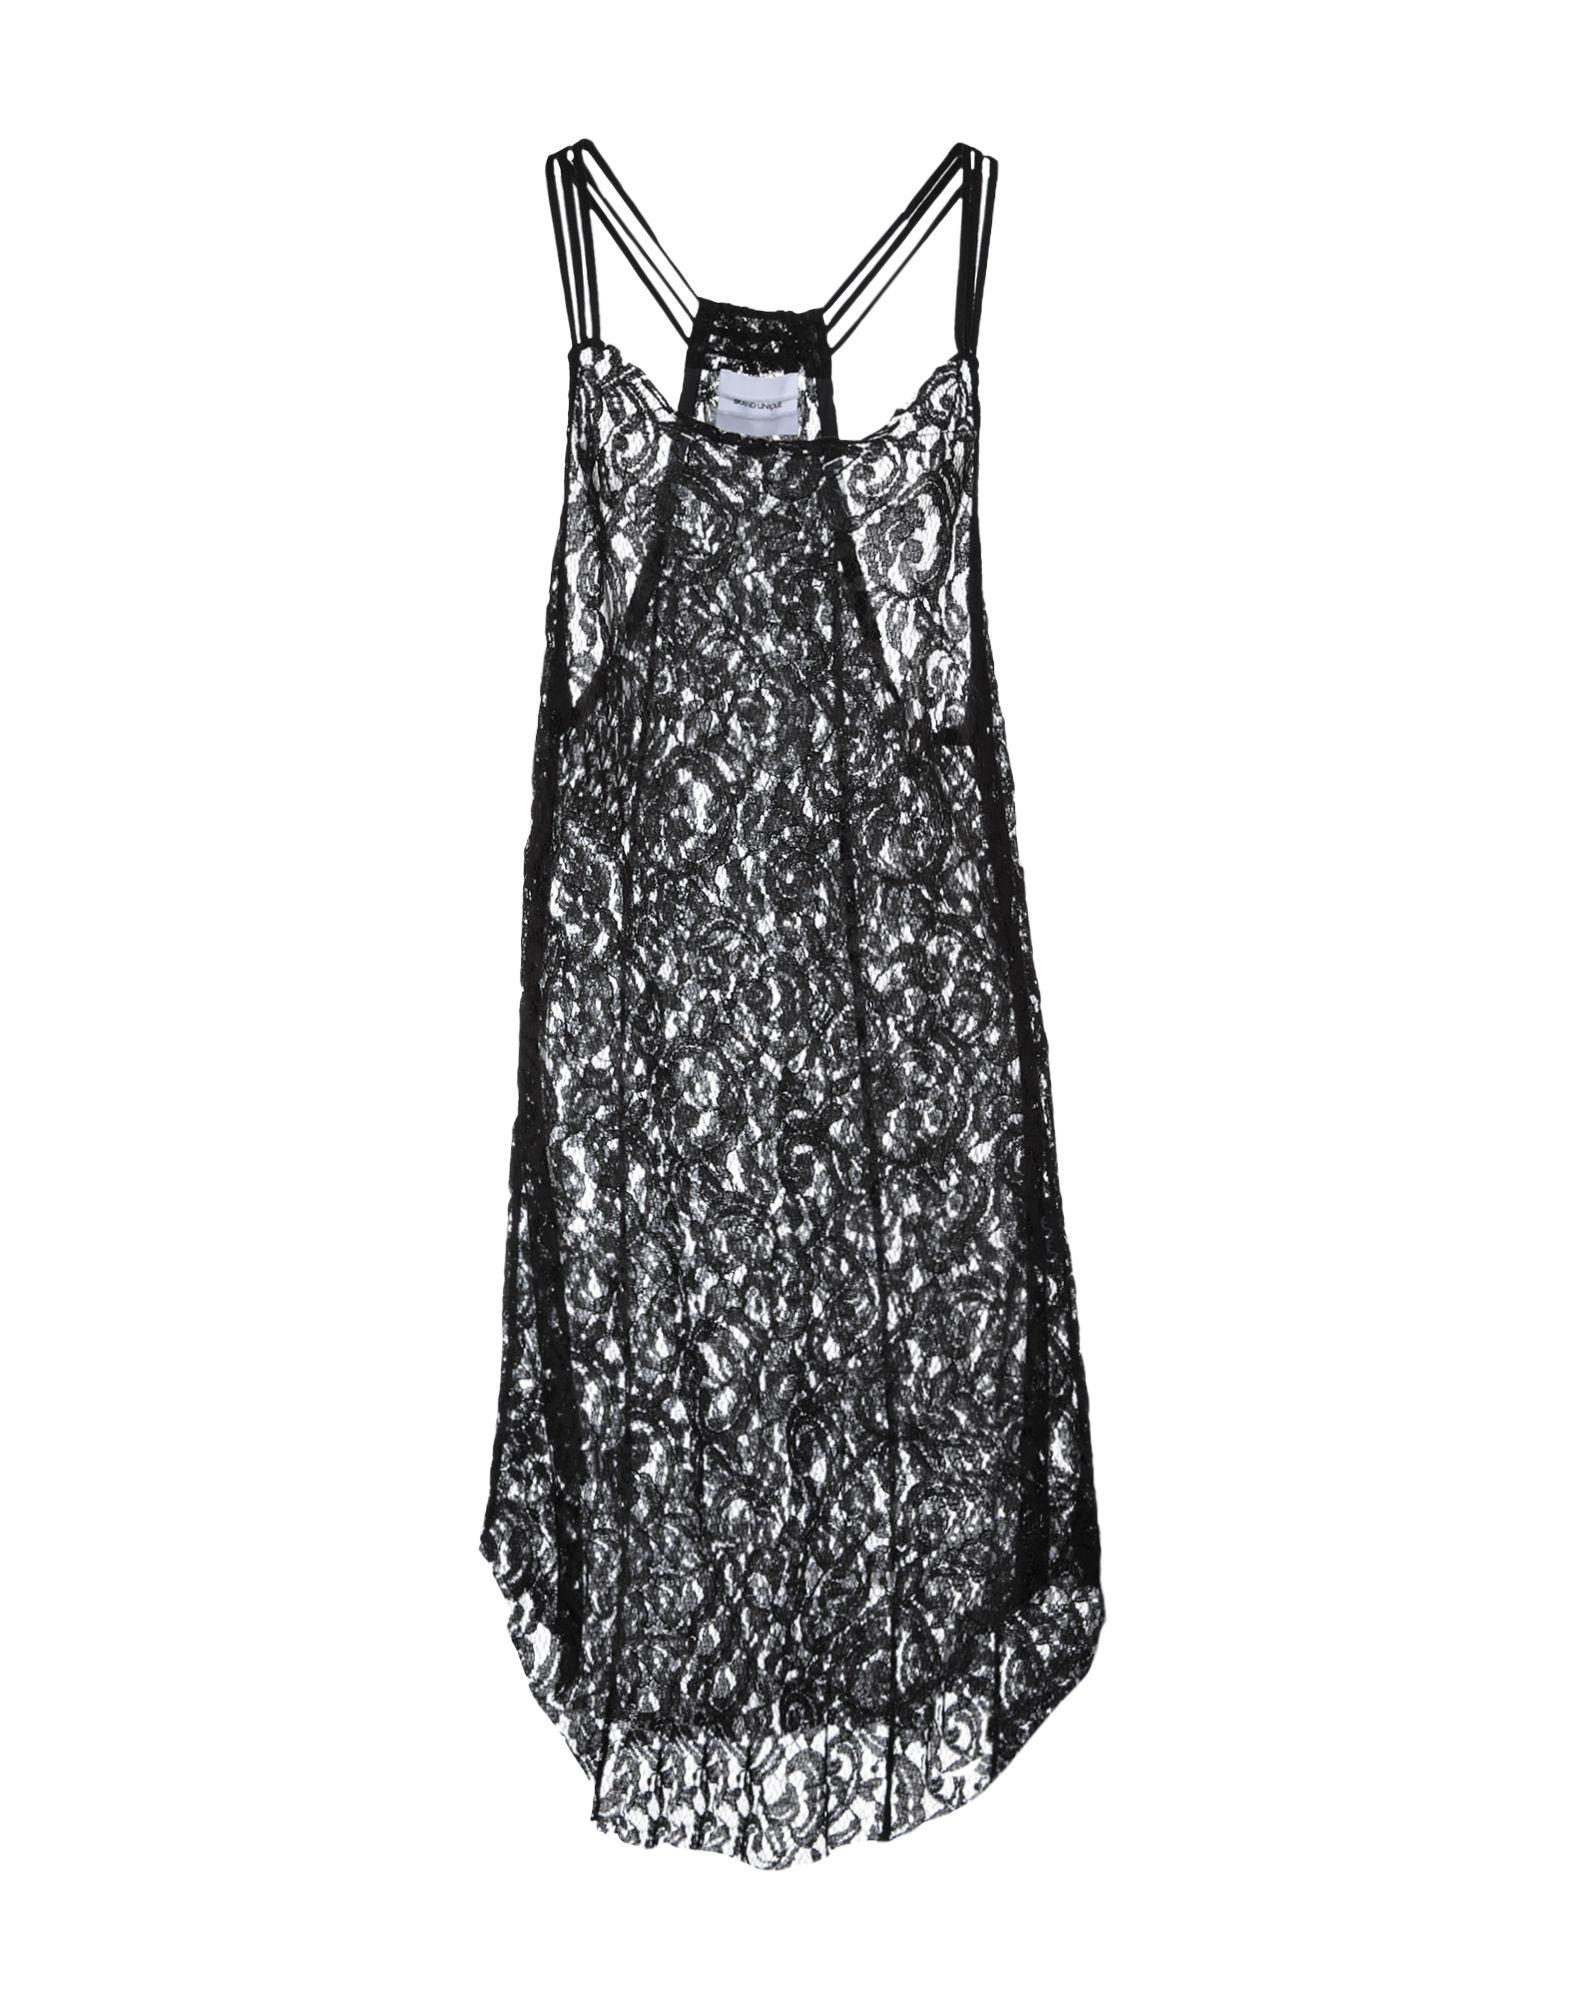 BRAND UNIQUE Платье длиной 3/4 micocah brand famous brand women handbags solid color environmental pu leather women messenger bags fashion bag 3 colors gl30027